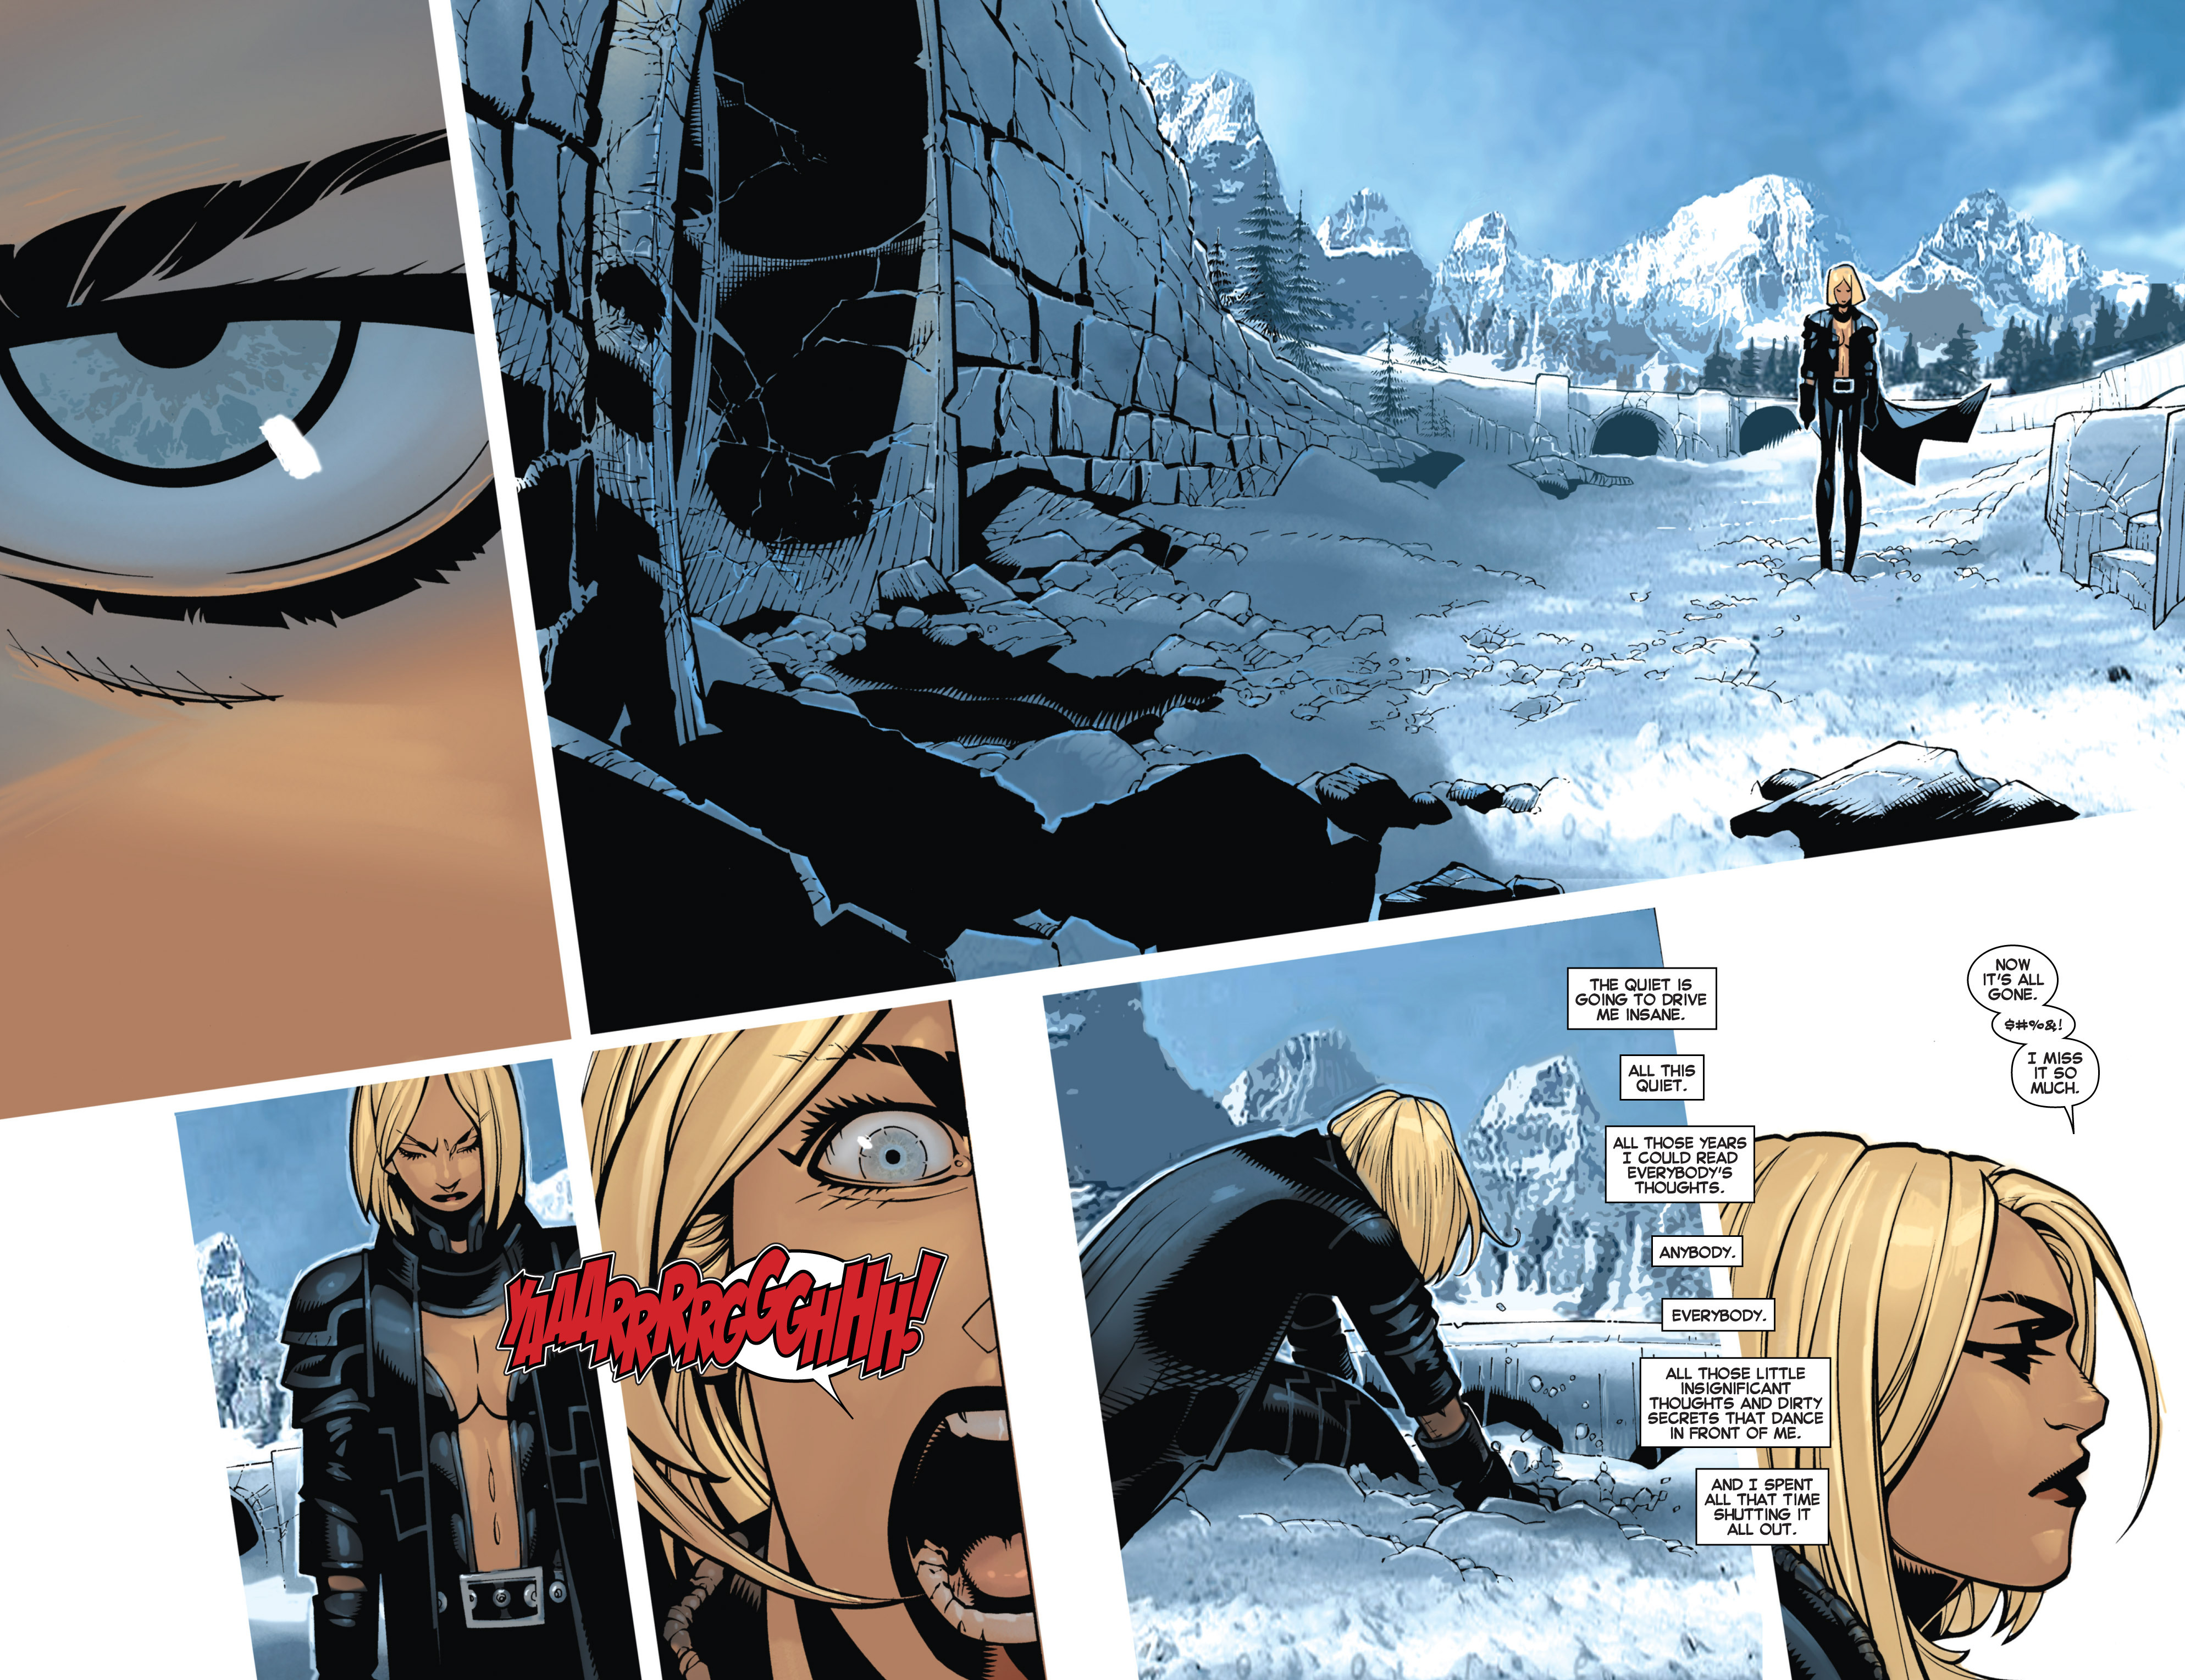 Read online Uncanny X-Men (2013) comic -  Issue # _TPB 1 - Revolution - 27